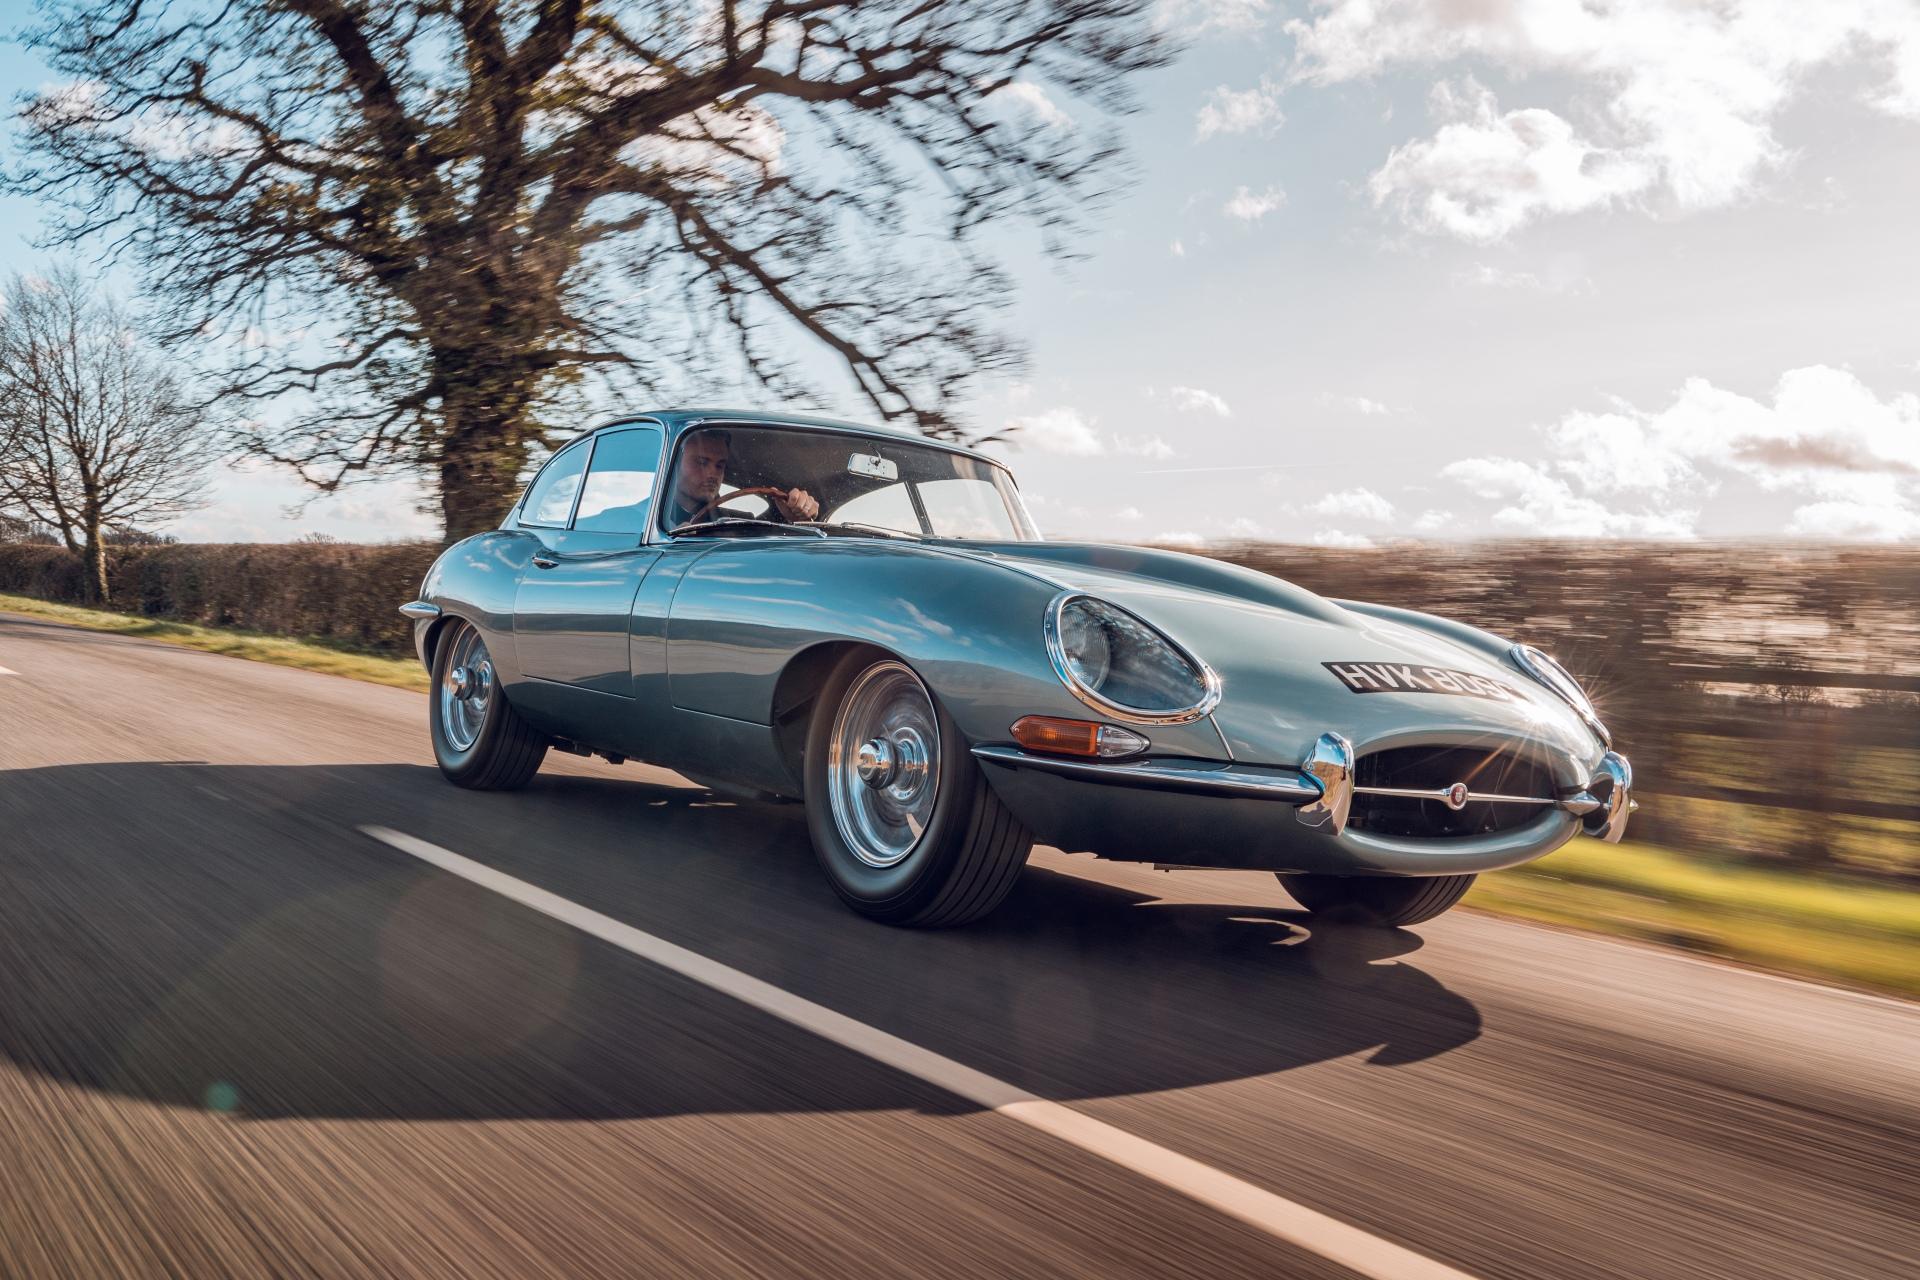 Jaguar E-Type Reborn 1965 Series 1 4.2 driving